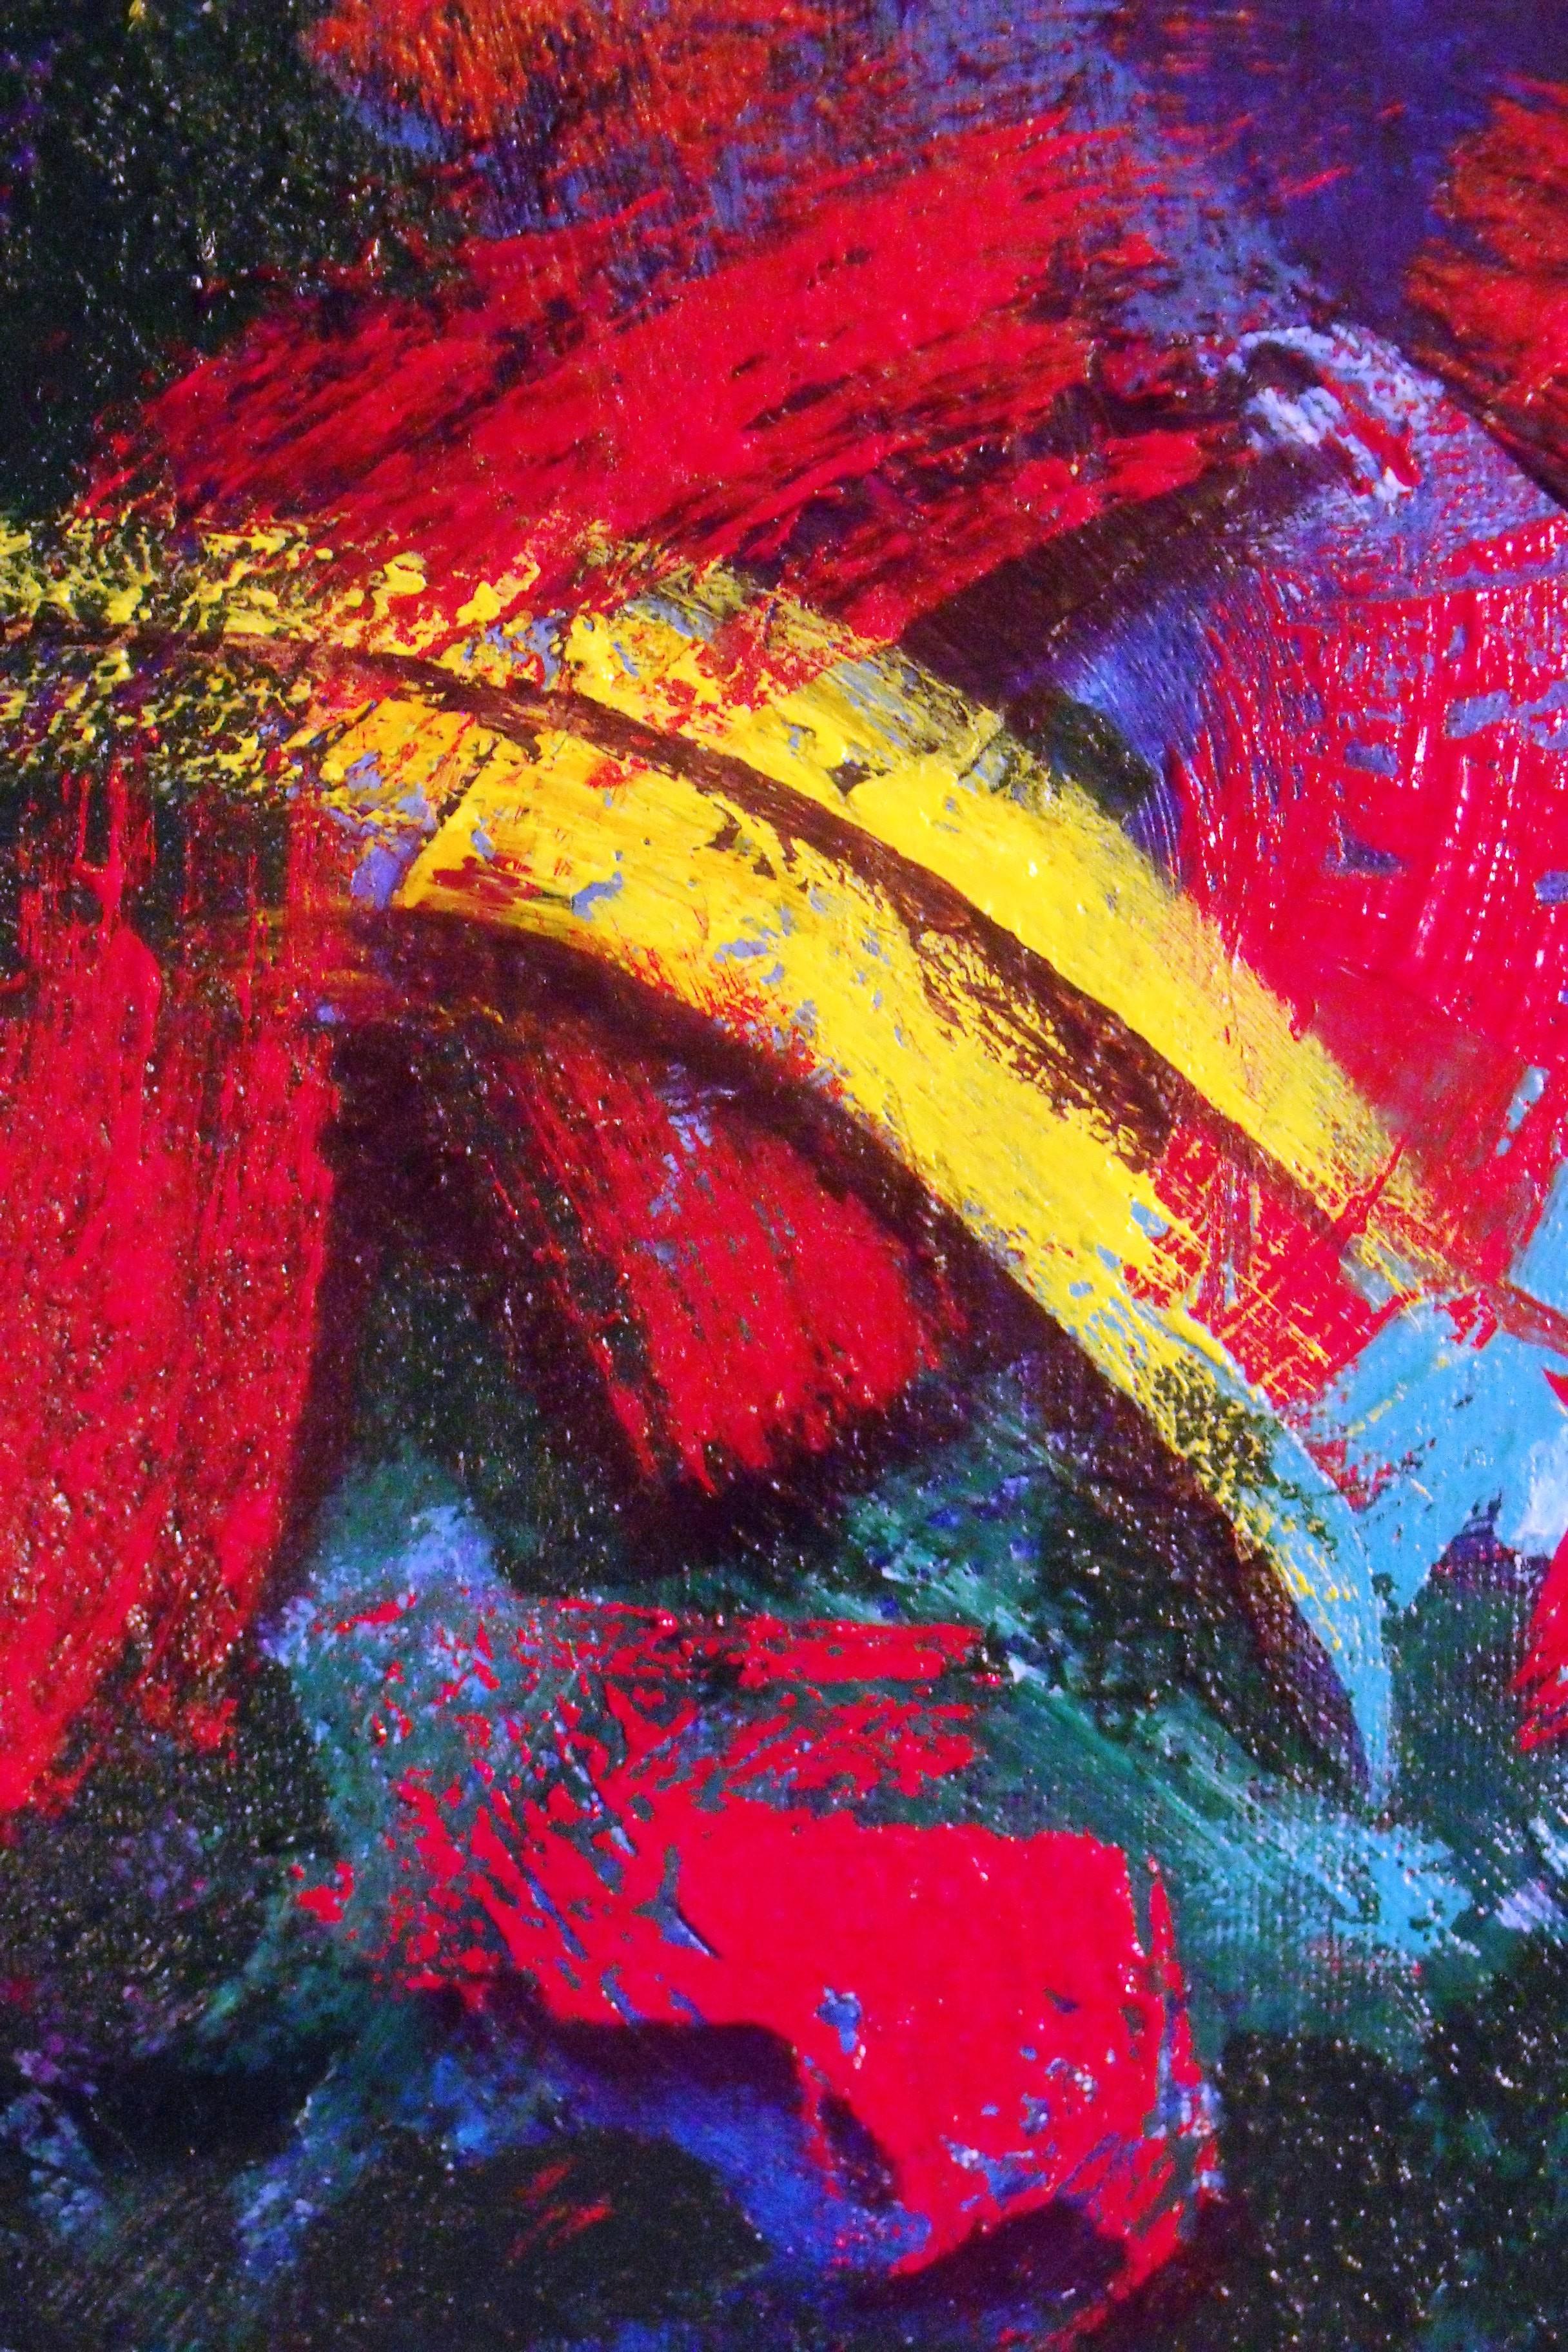 Abstract Art 1, Impressionism